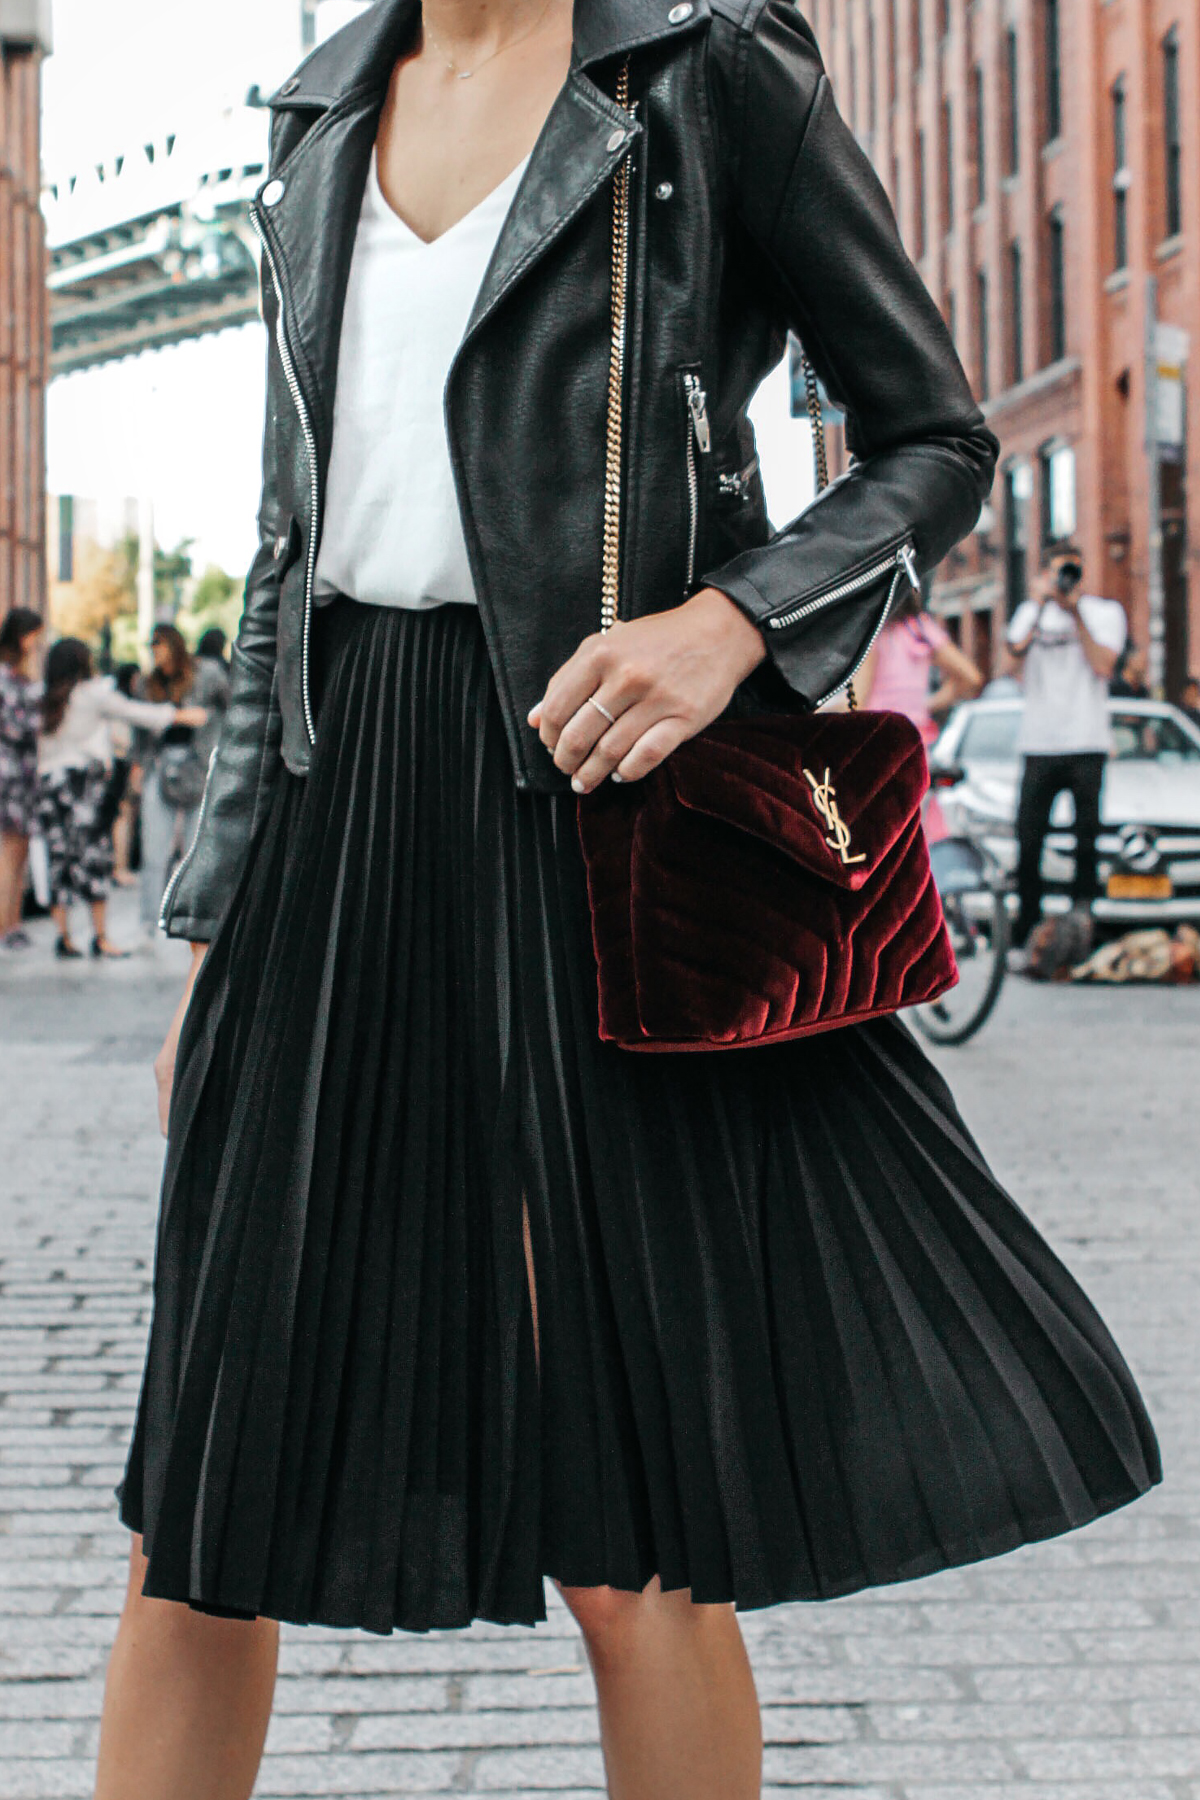 Black Leather Jacket Black Pleated Midi Skirt Saint Laurent Burgundy Velvet Bag Fashion Jackson Dallas Blogger Fashion Blogger Street Style NFYW Dumbo Bridge